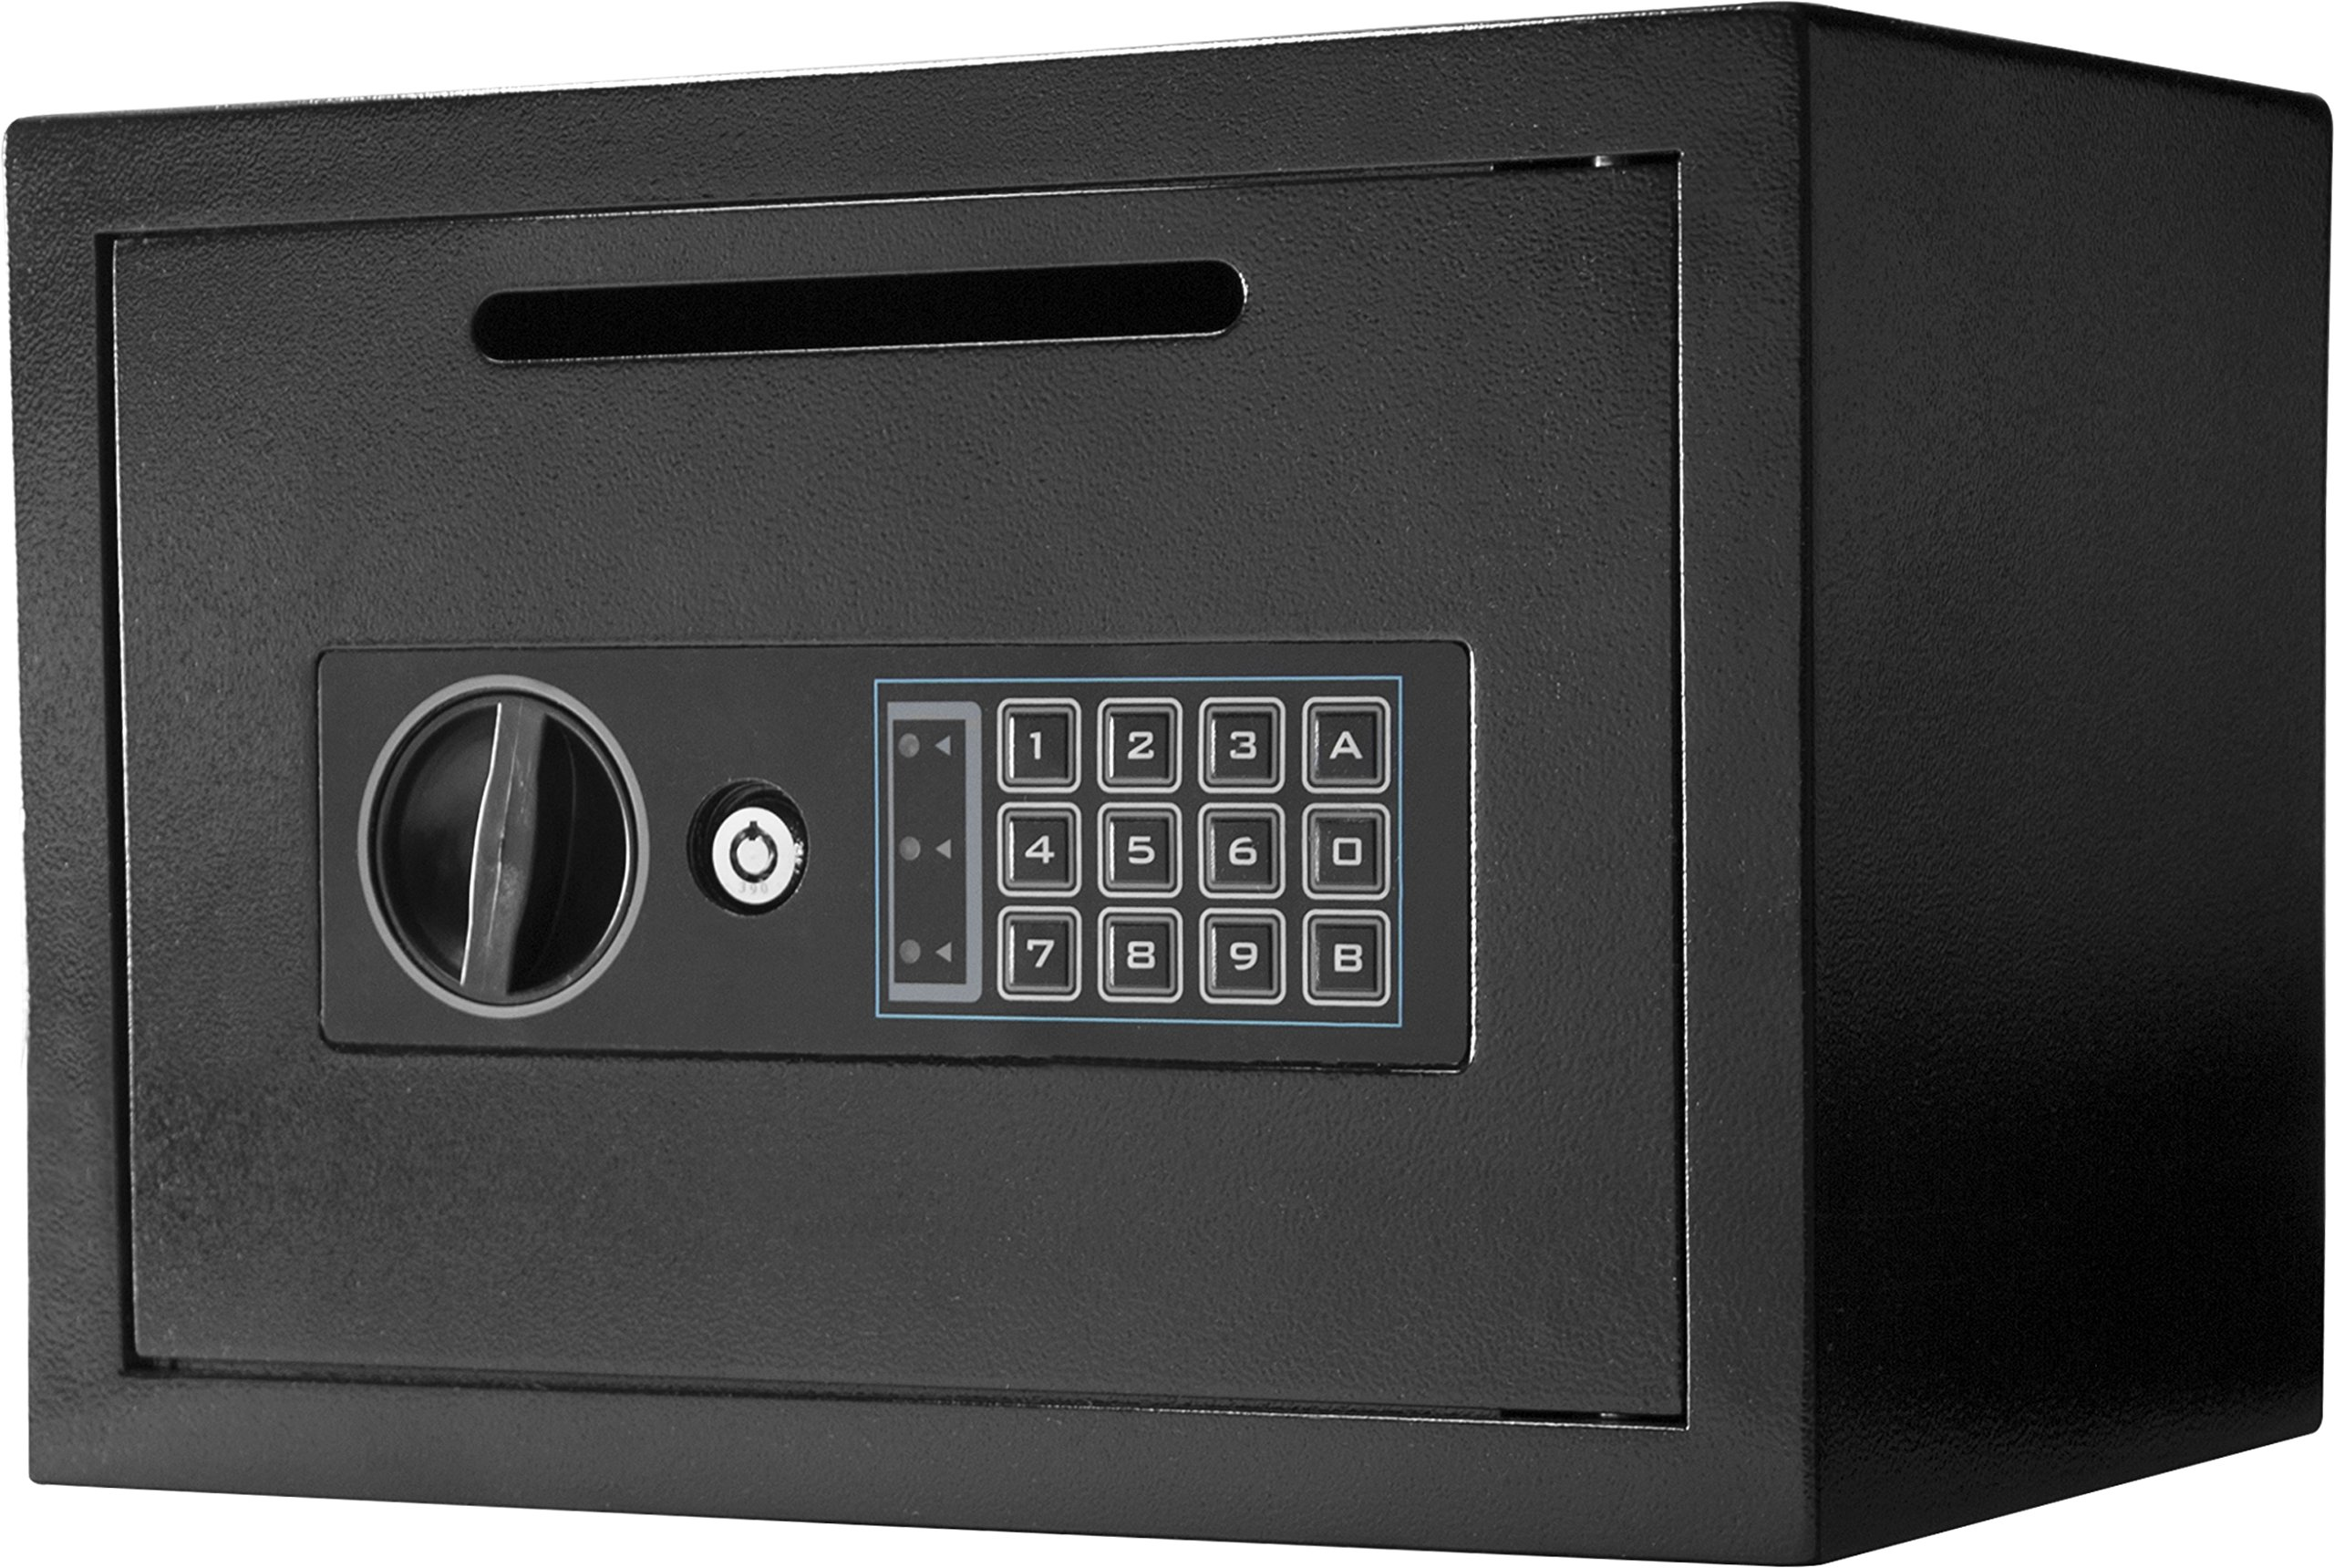 BARSKA AX11934 Compact Keypad Security Depository Safe Box 0.57 Cubic Ft by BARSKA